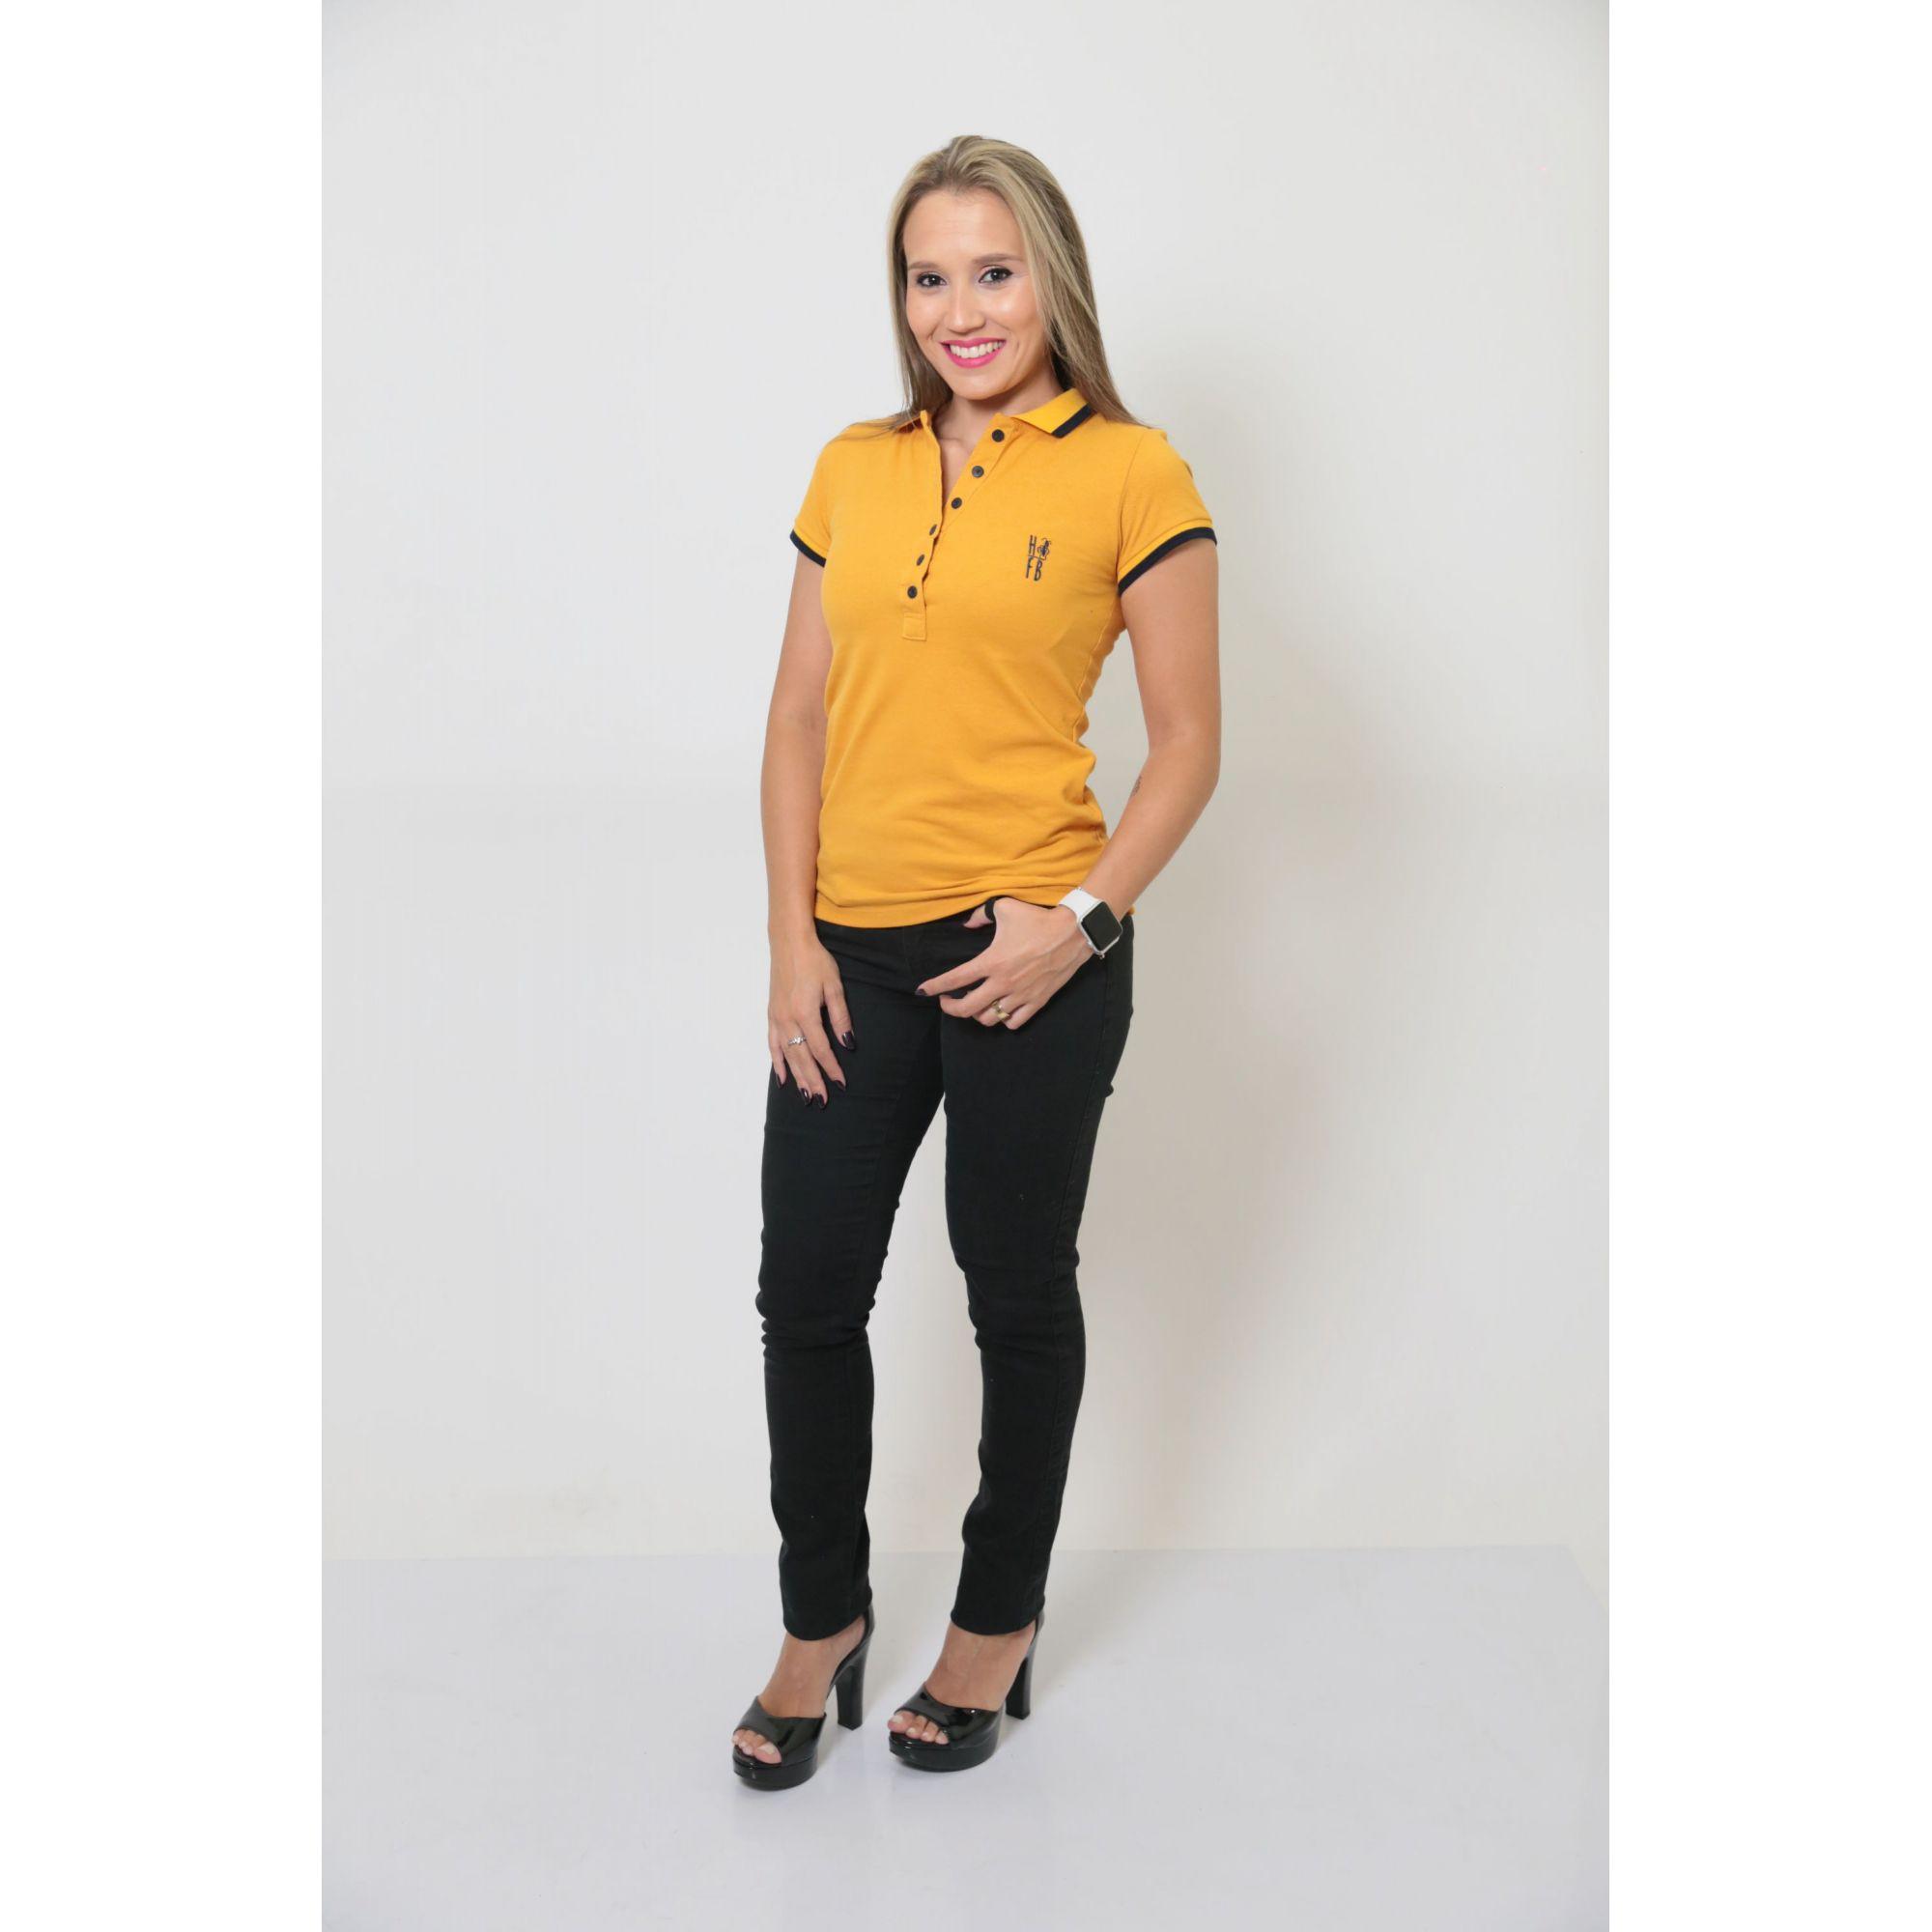 MÃE E FILHO > Kit 02 Peças - Camisas ou Body Polo Mostarda [Coleção Tal Mãe Tal Filho]  - Heitor Fashion Brazil